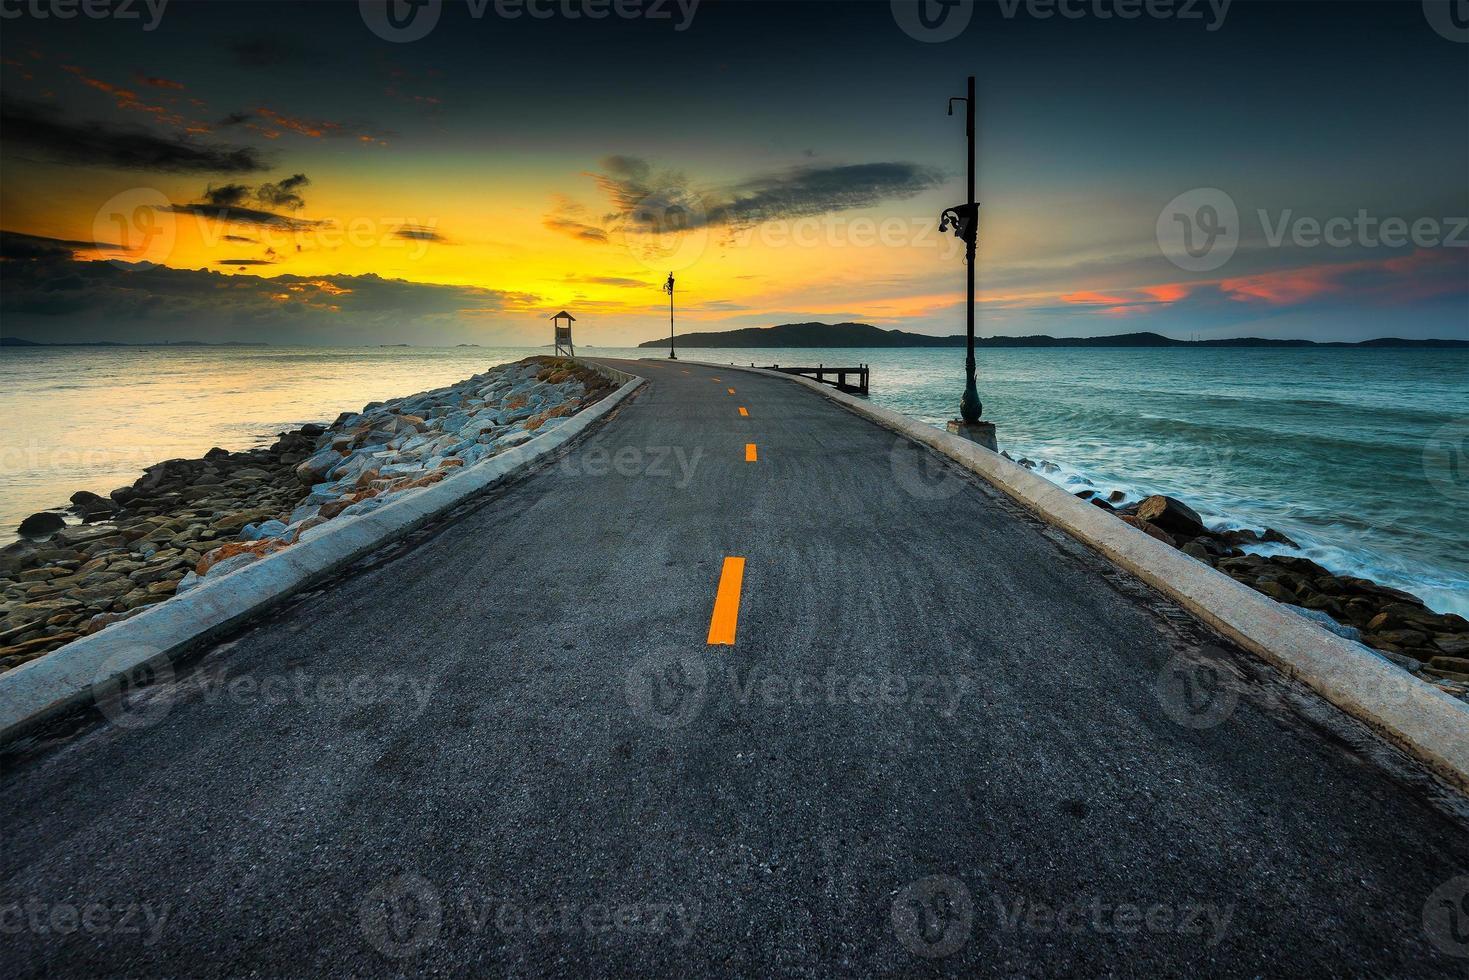 Vista del paisaje de la mañana con el mar. foto